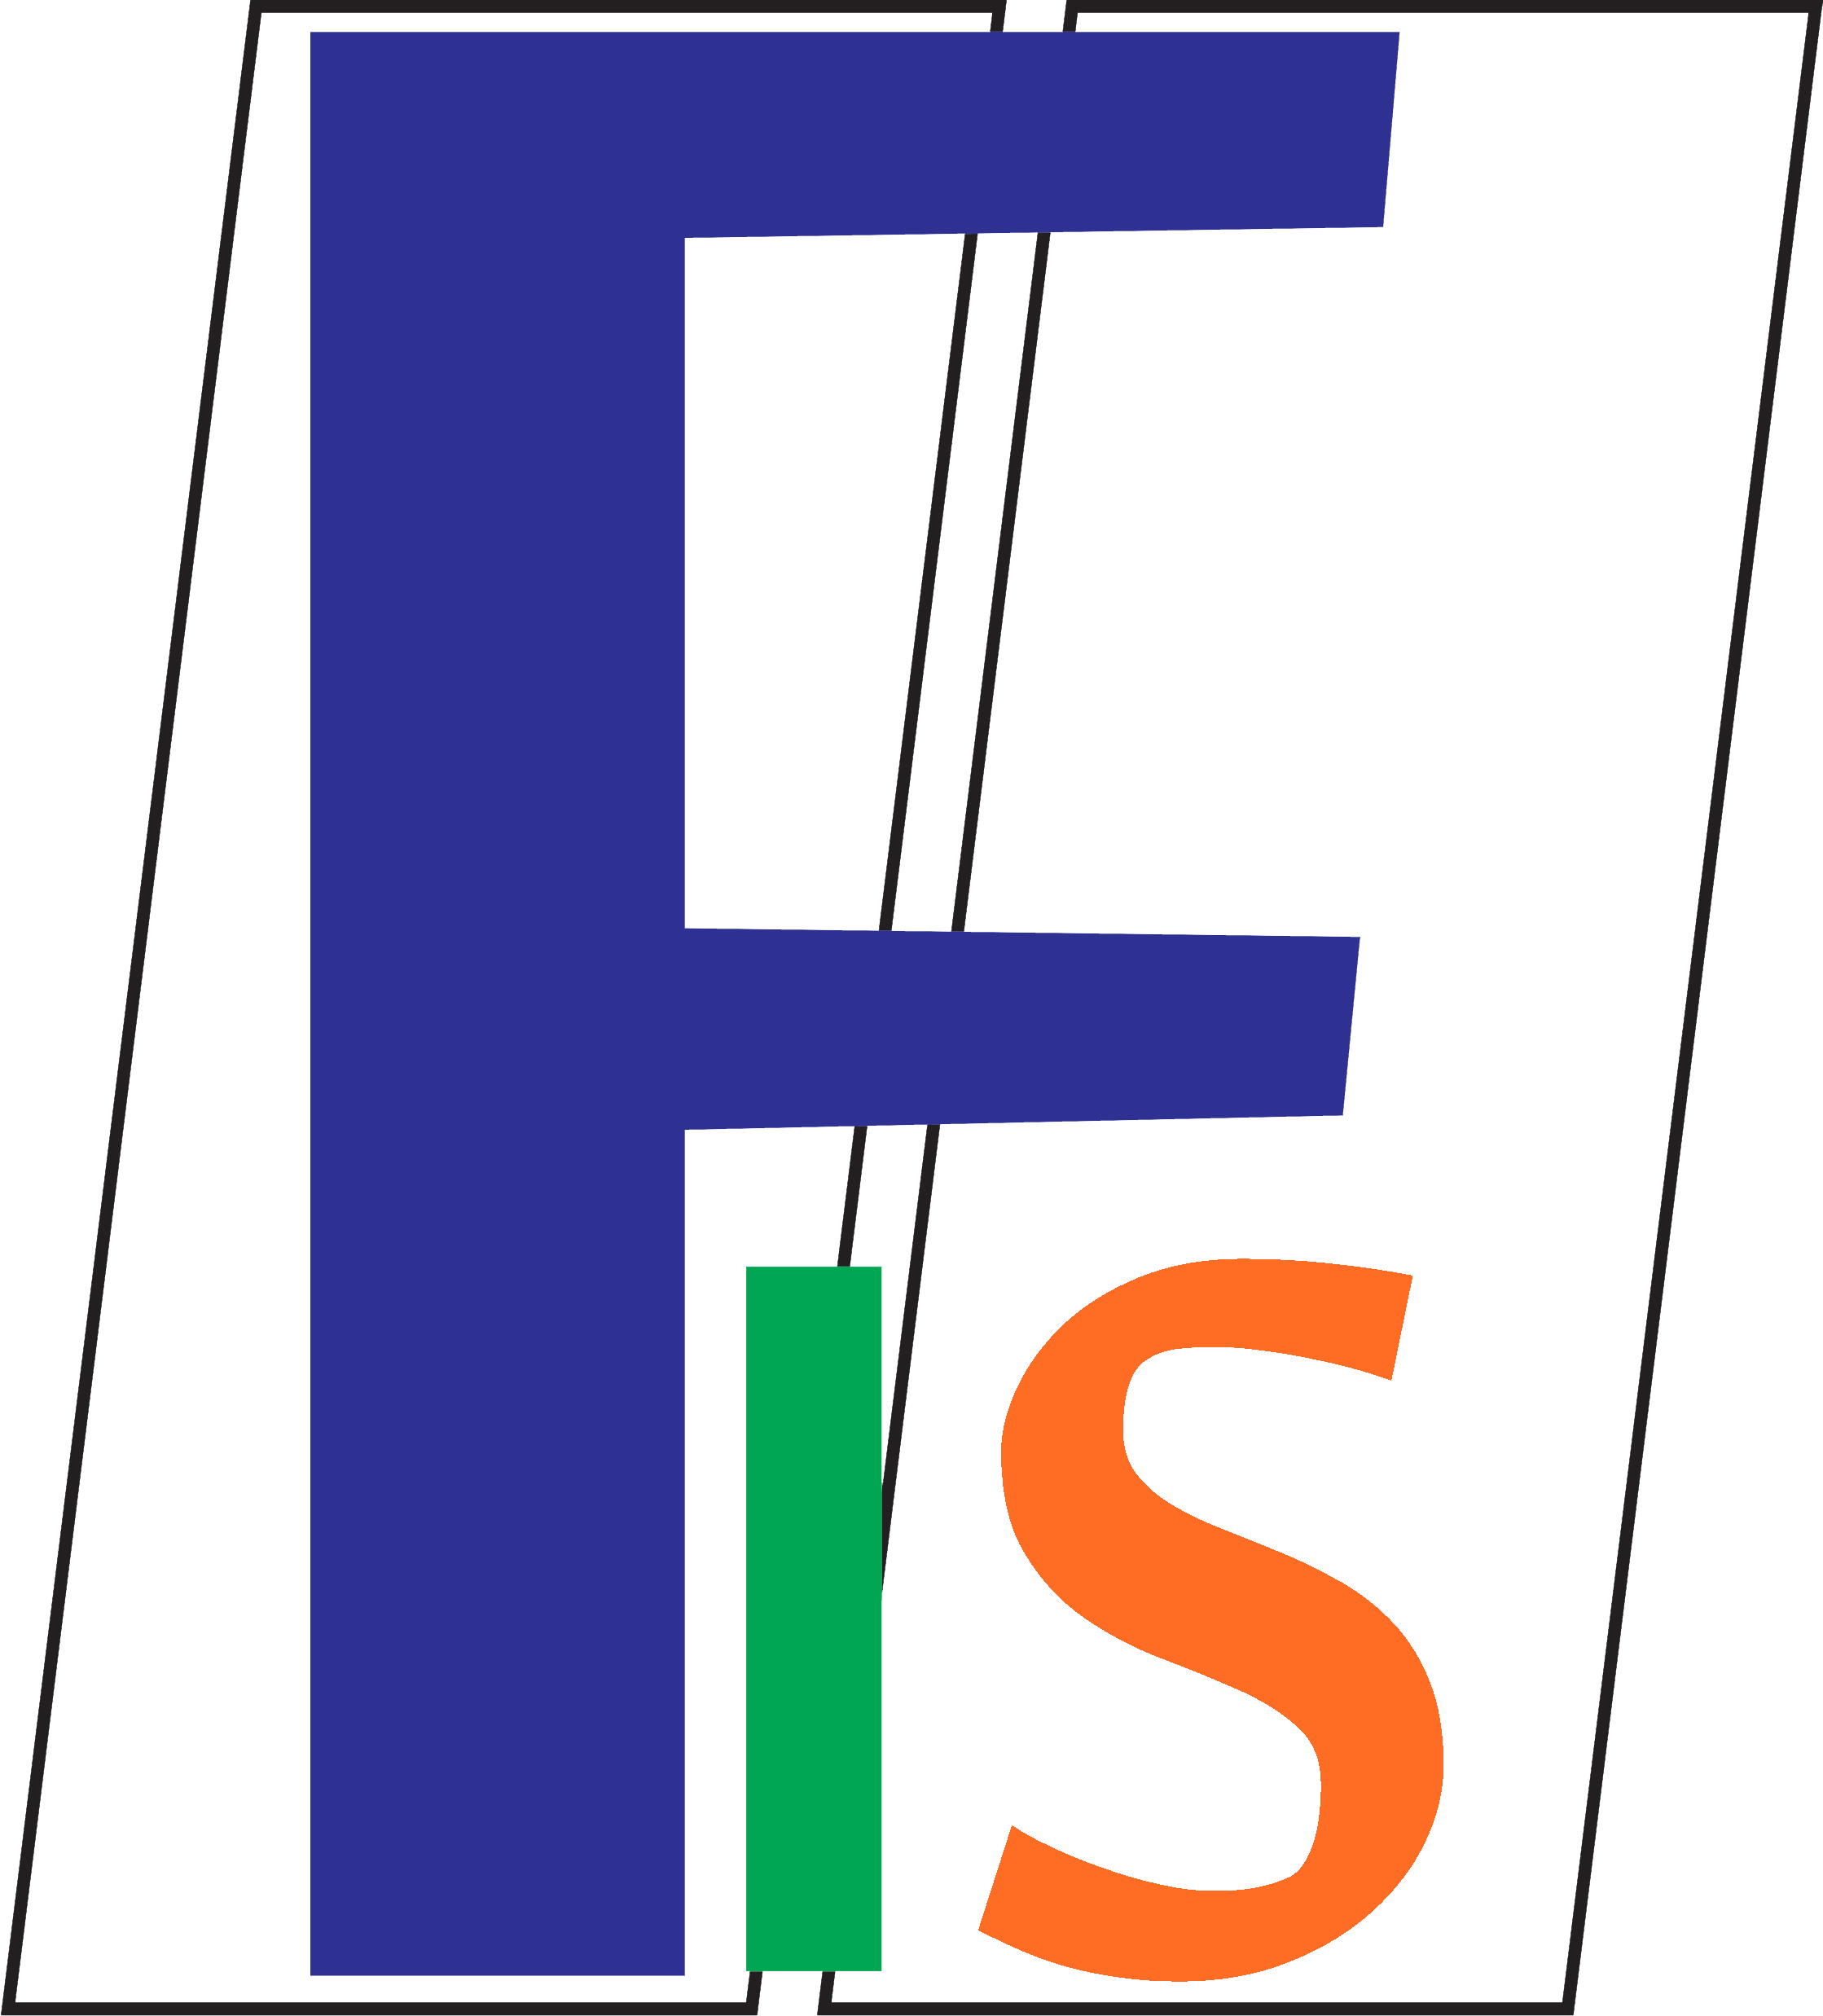 CV. Fildzah Infokom Solusi (FIS)